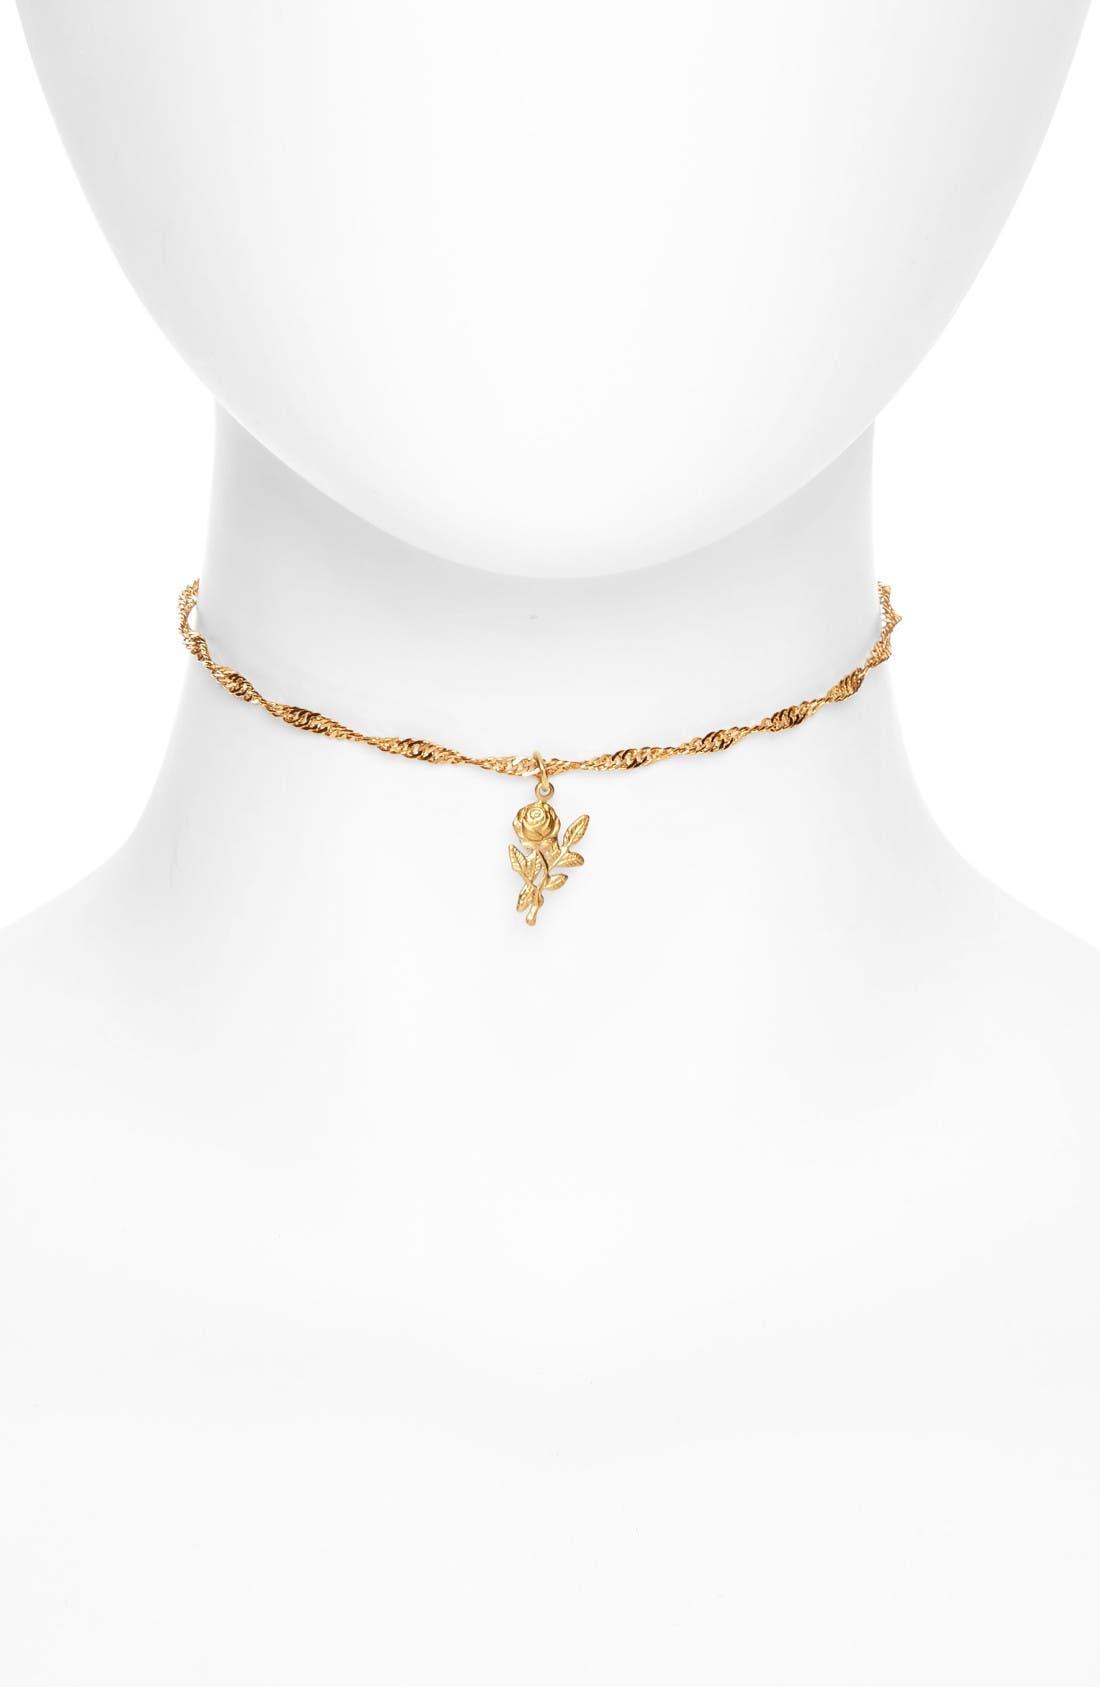 Alternate Image 1 Selected - FRASIER STERLING Forever Yours Charm Necklace